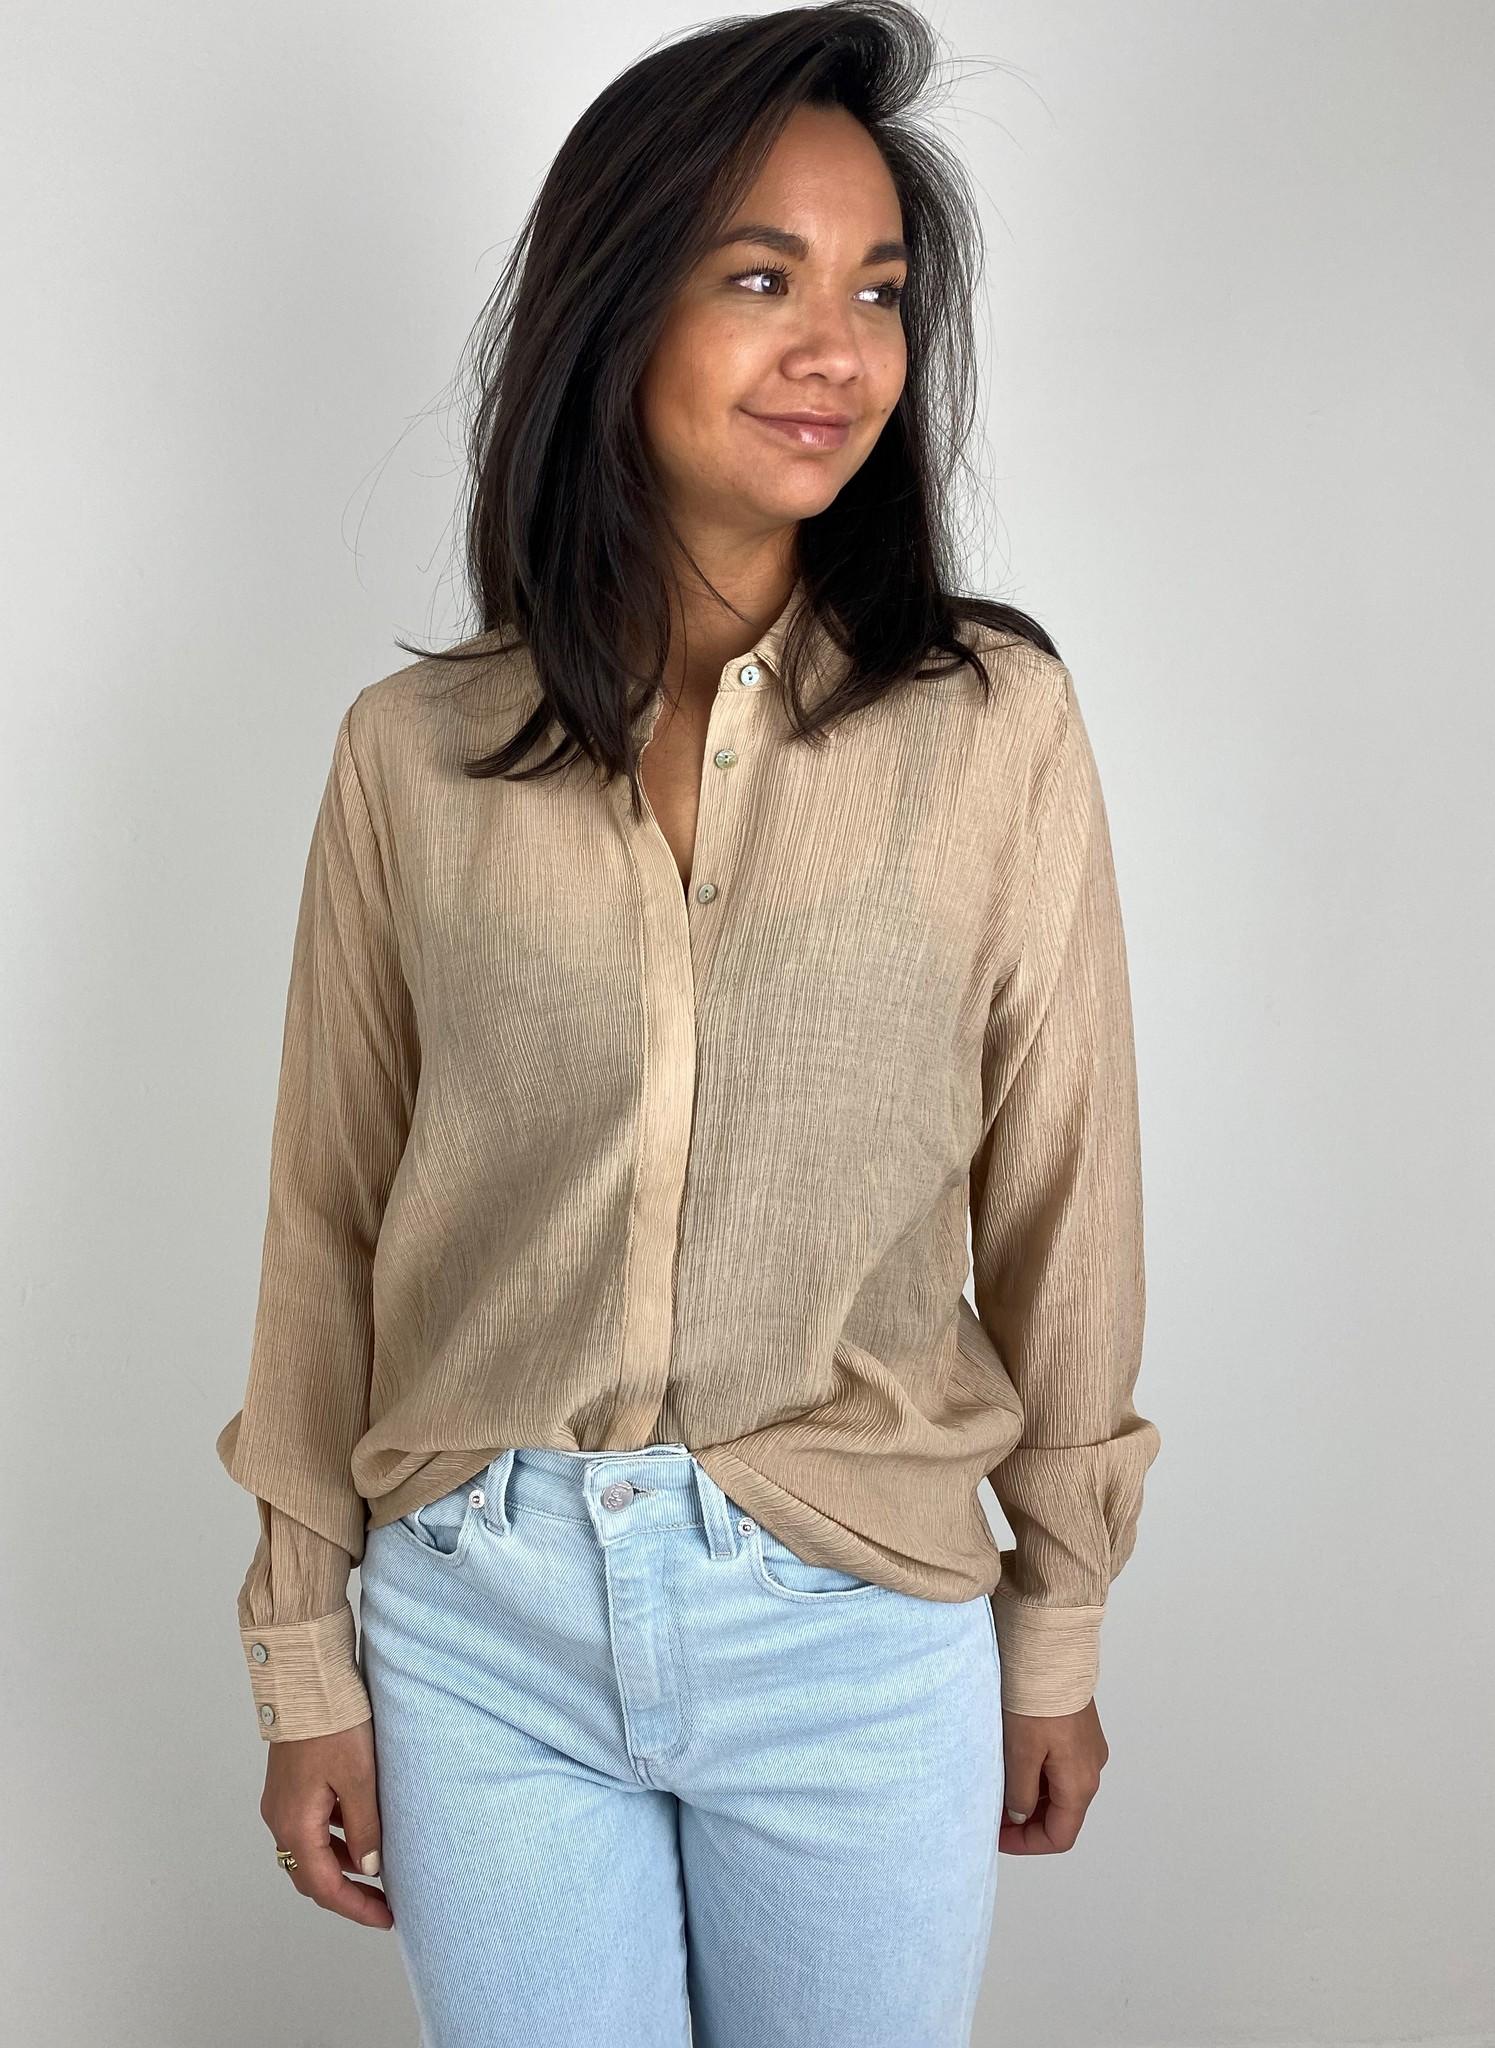 Blouse KAmorina shirt dach nomad-1